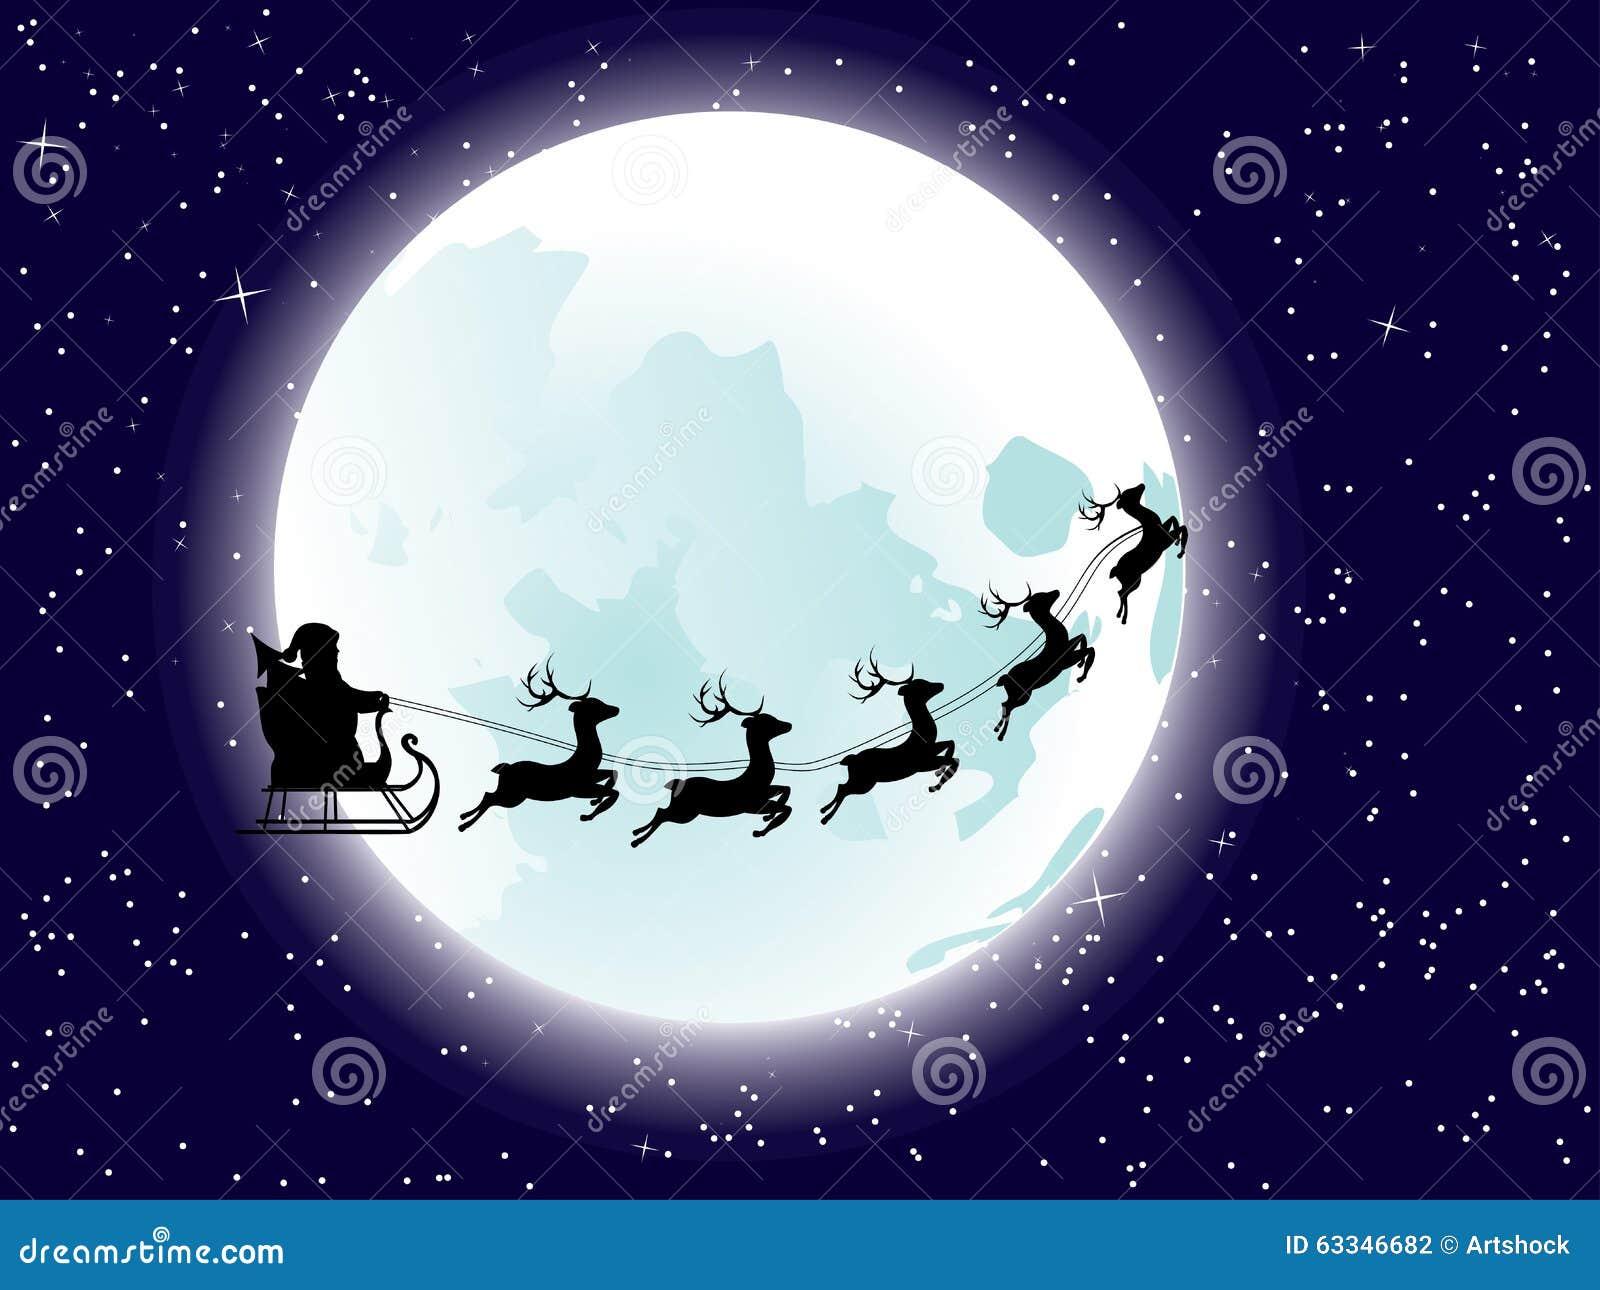 Flying Santa And Full Moon Stock Vector - Image: 63346682